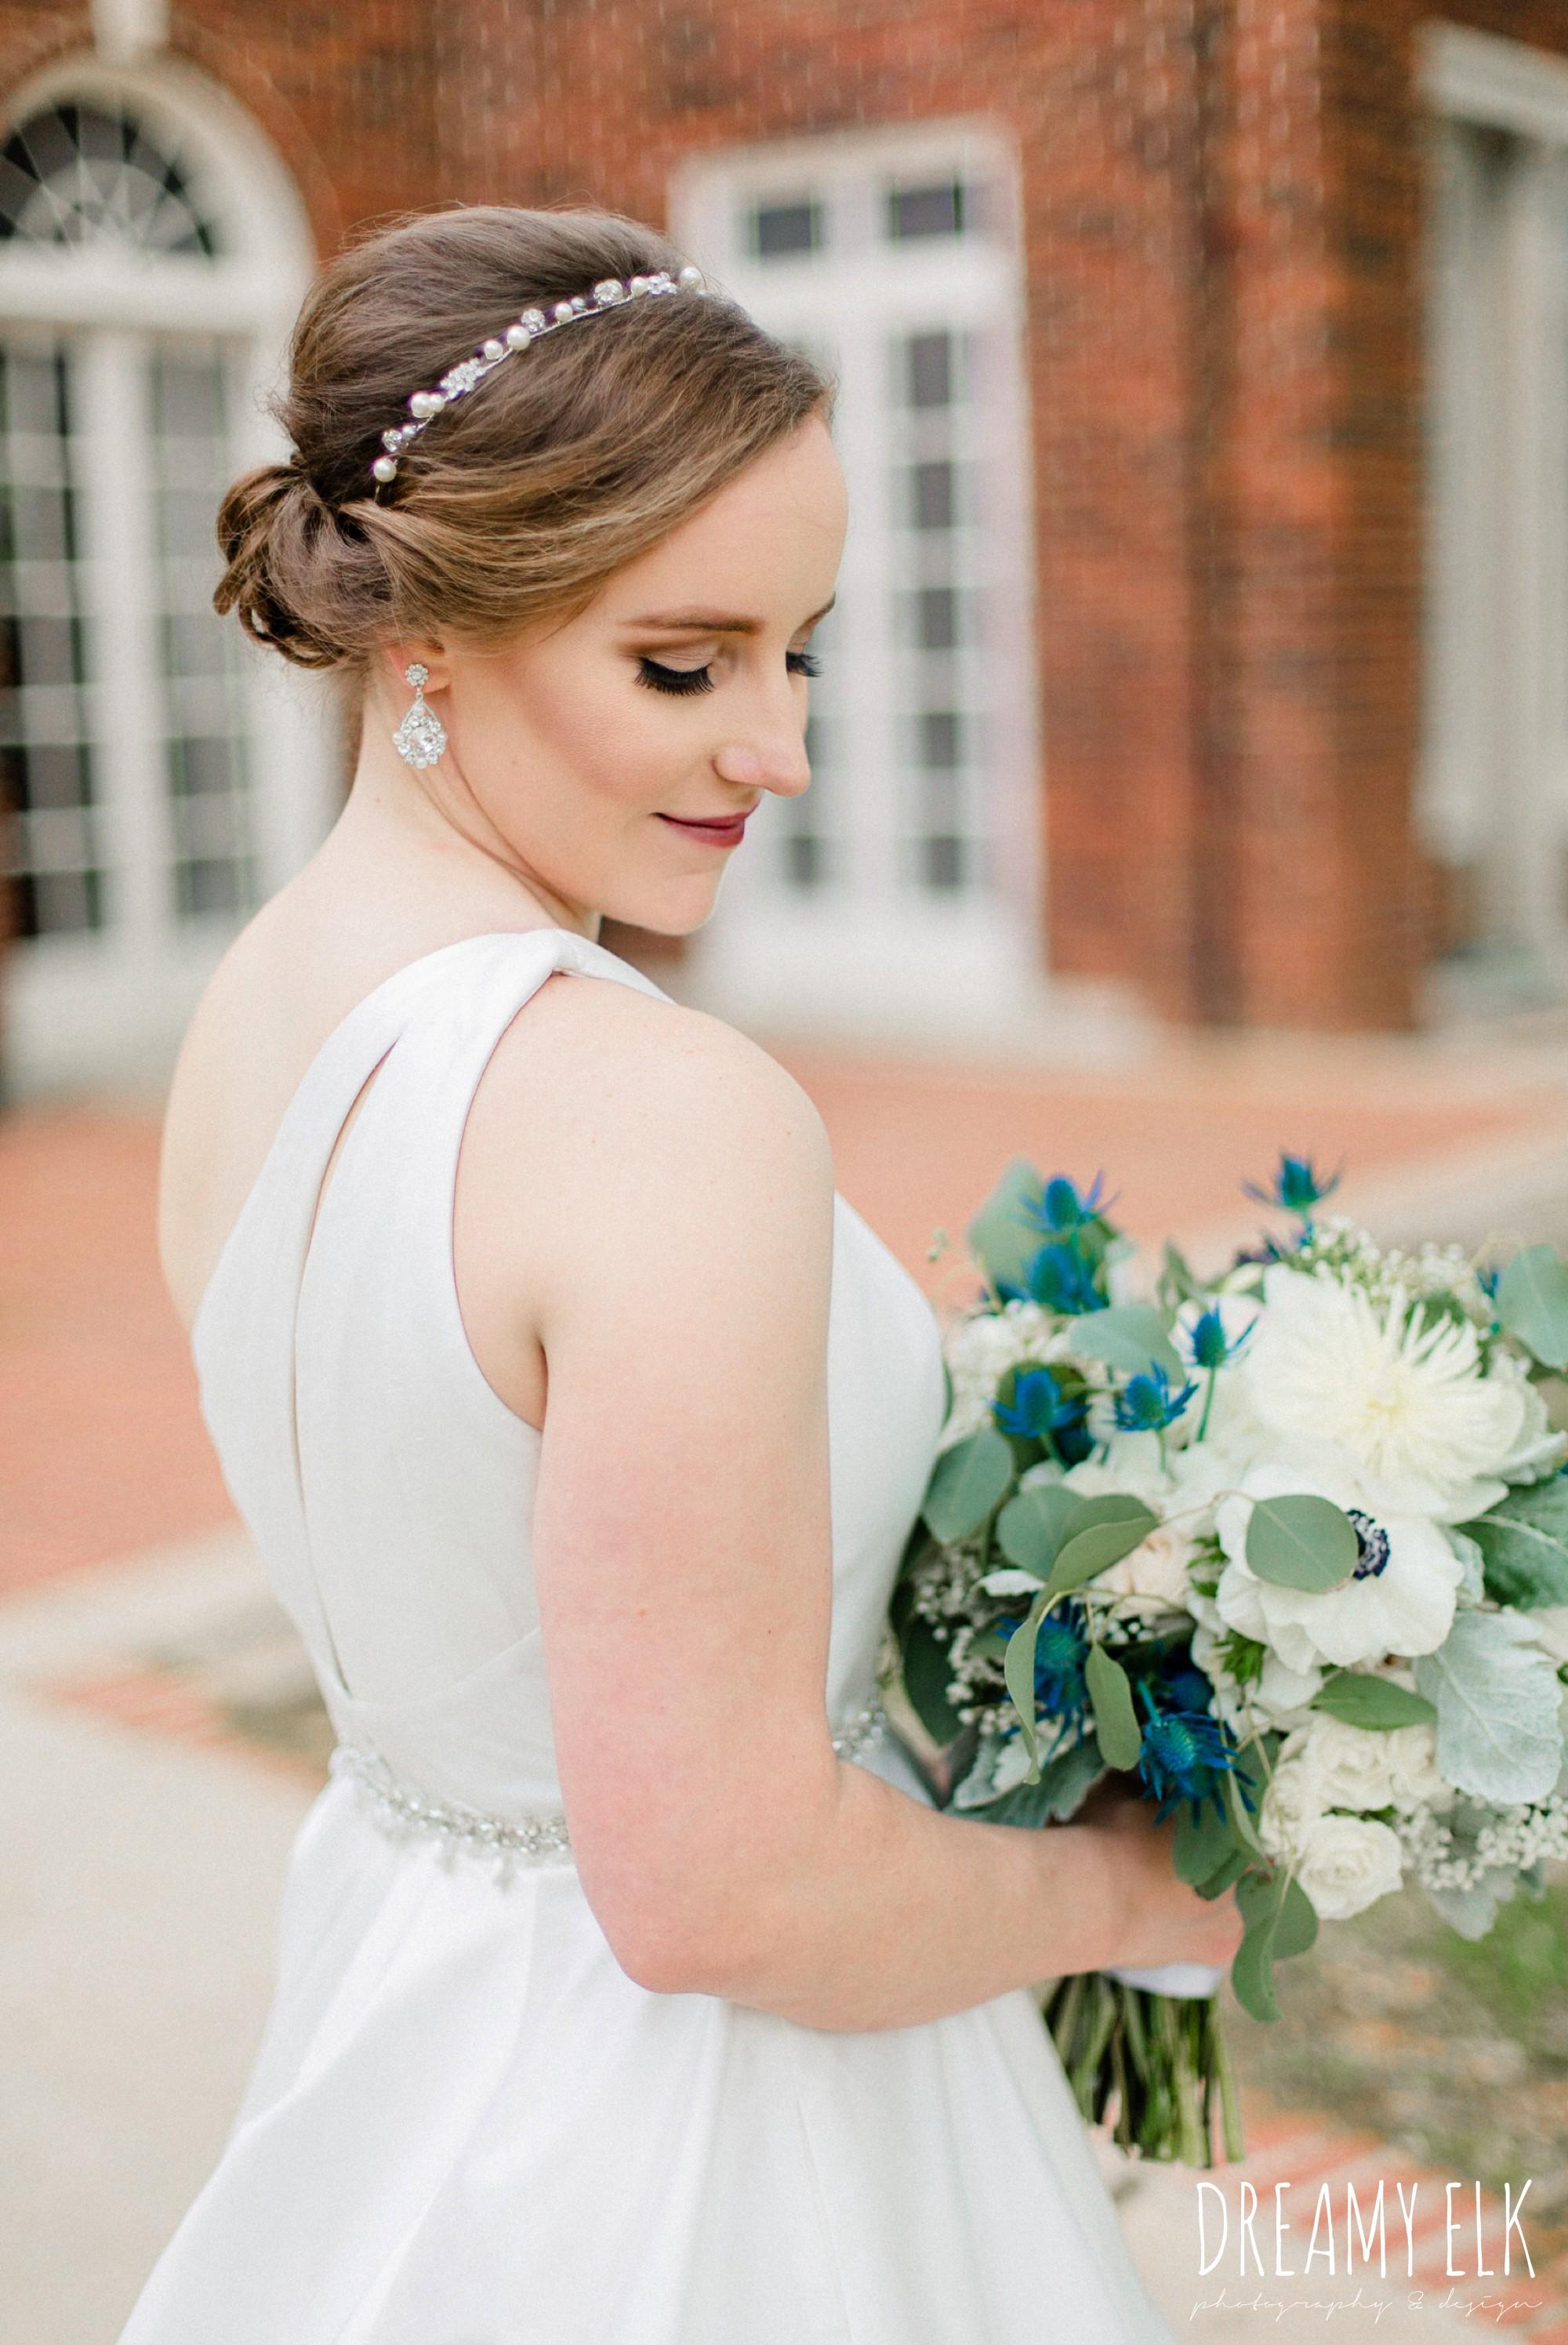 blue wedding bouquet, modern wedding dress ballgown, spring wedding, the astin mansion, bryan, texas, spring wedding, dreamy elk photography and design